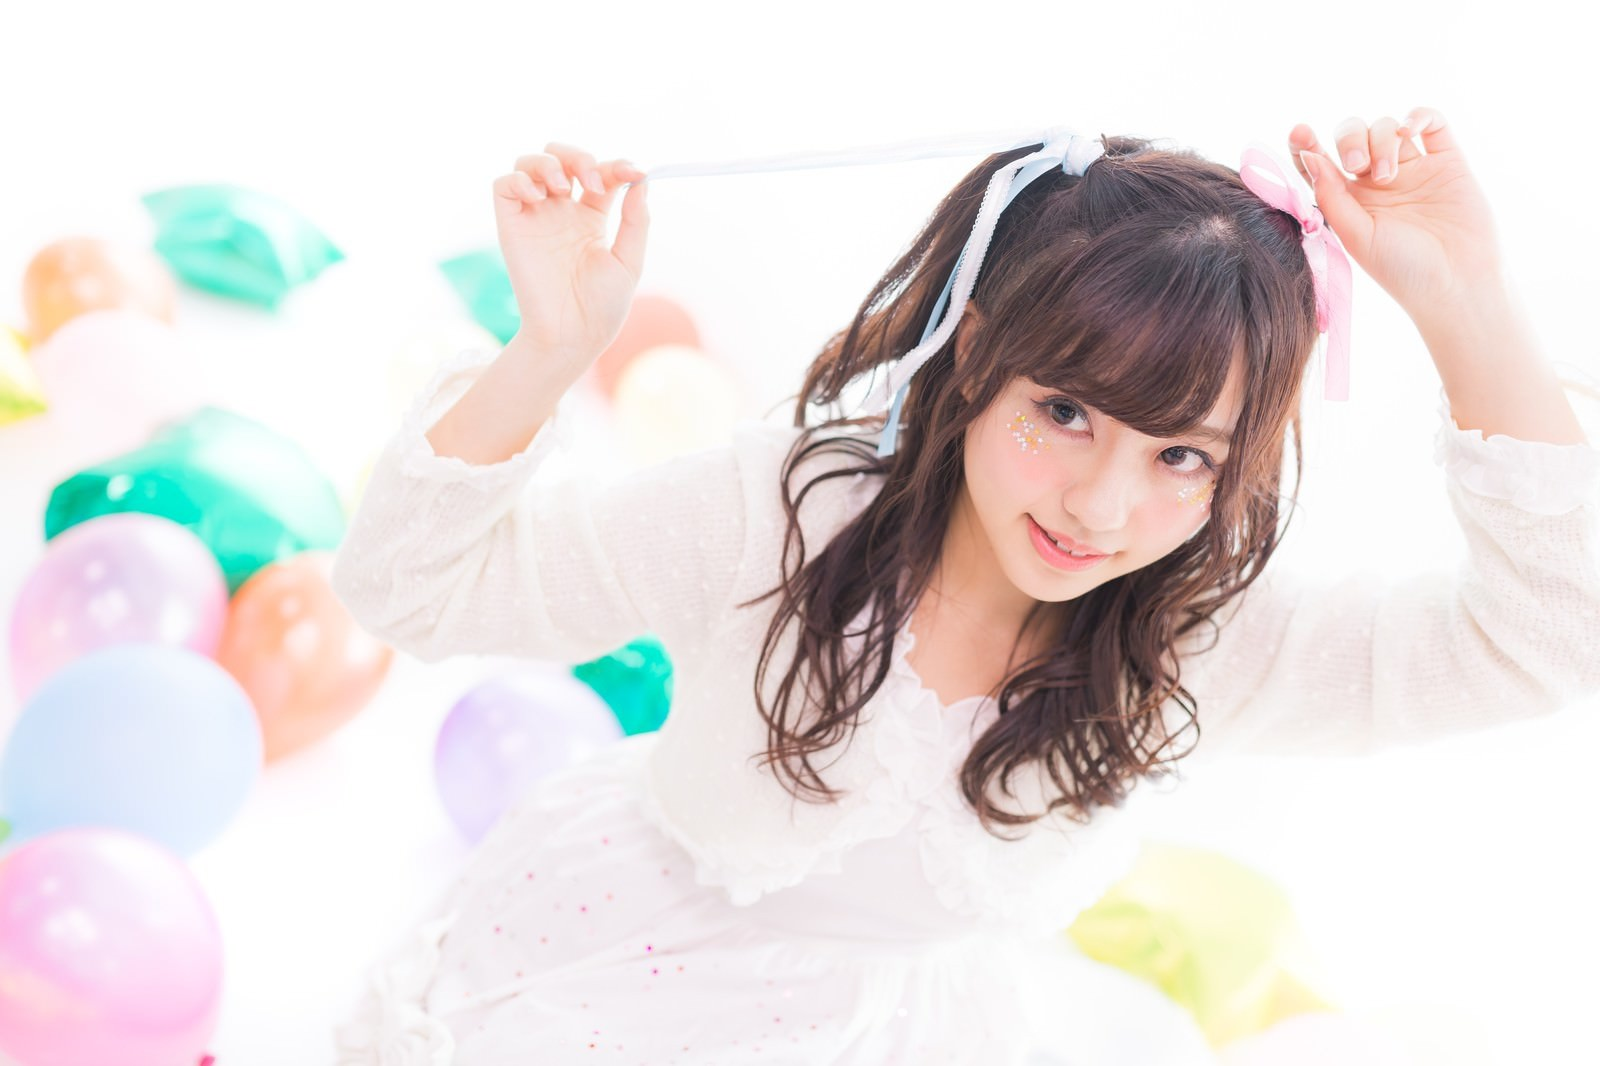 Yuka Kawamura Free Stock Photo Idol 06